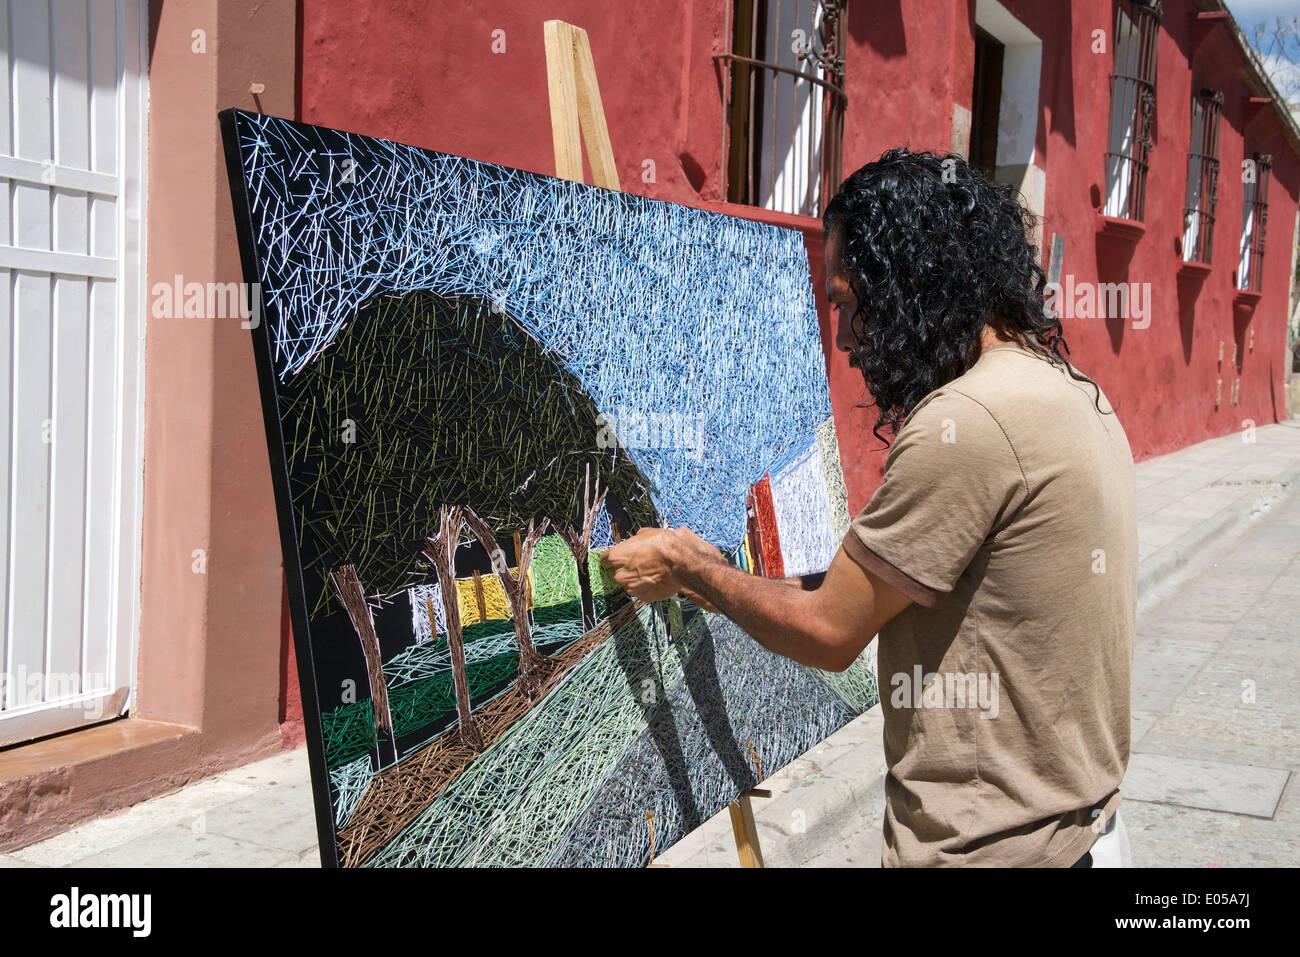 Artist creating needlework picture Oaxaca City Mexico - Stock Image